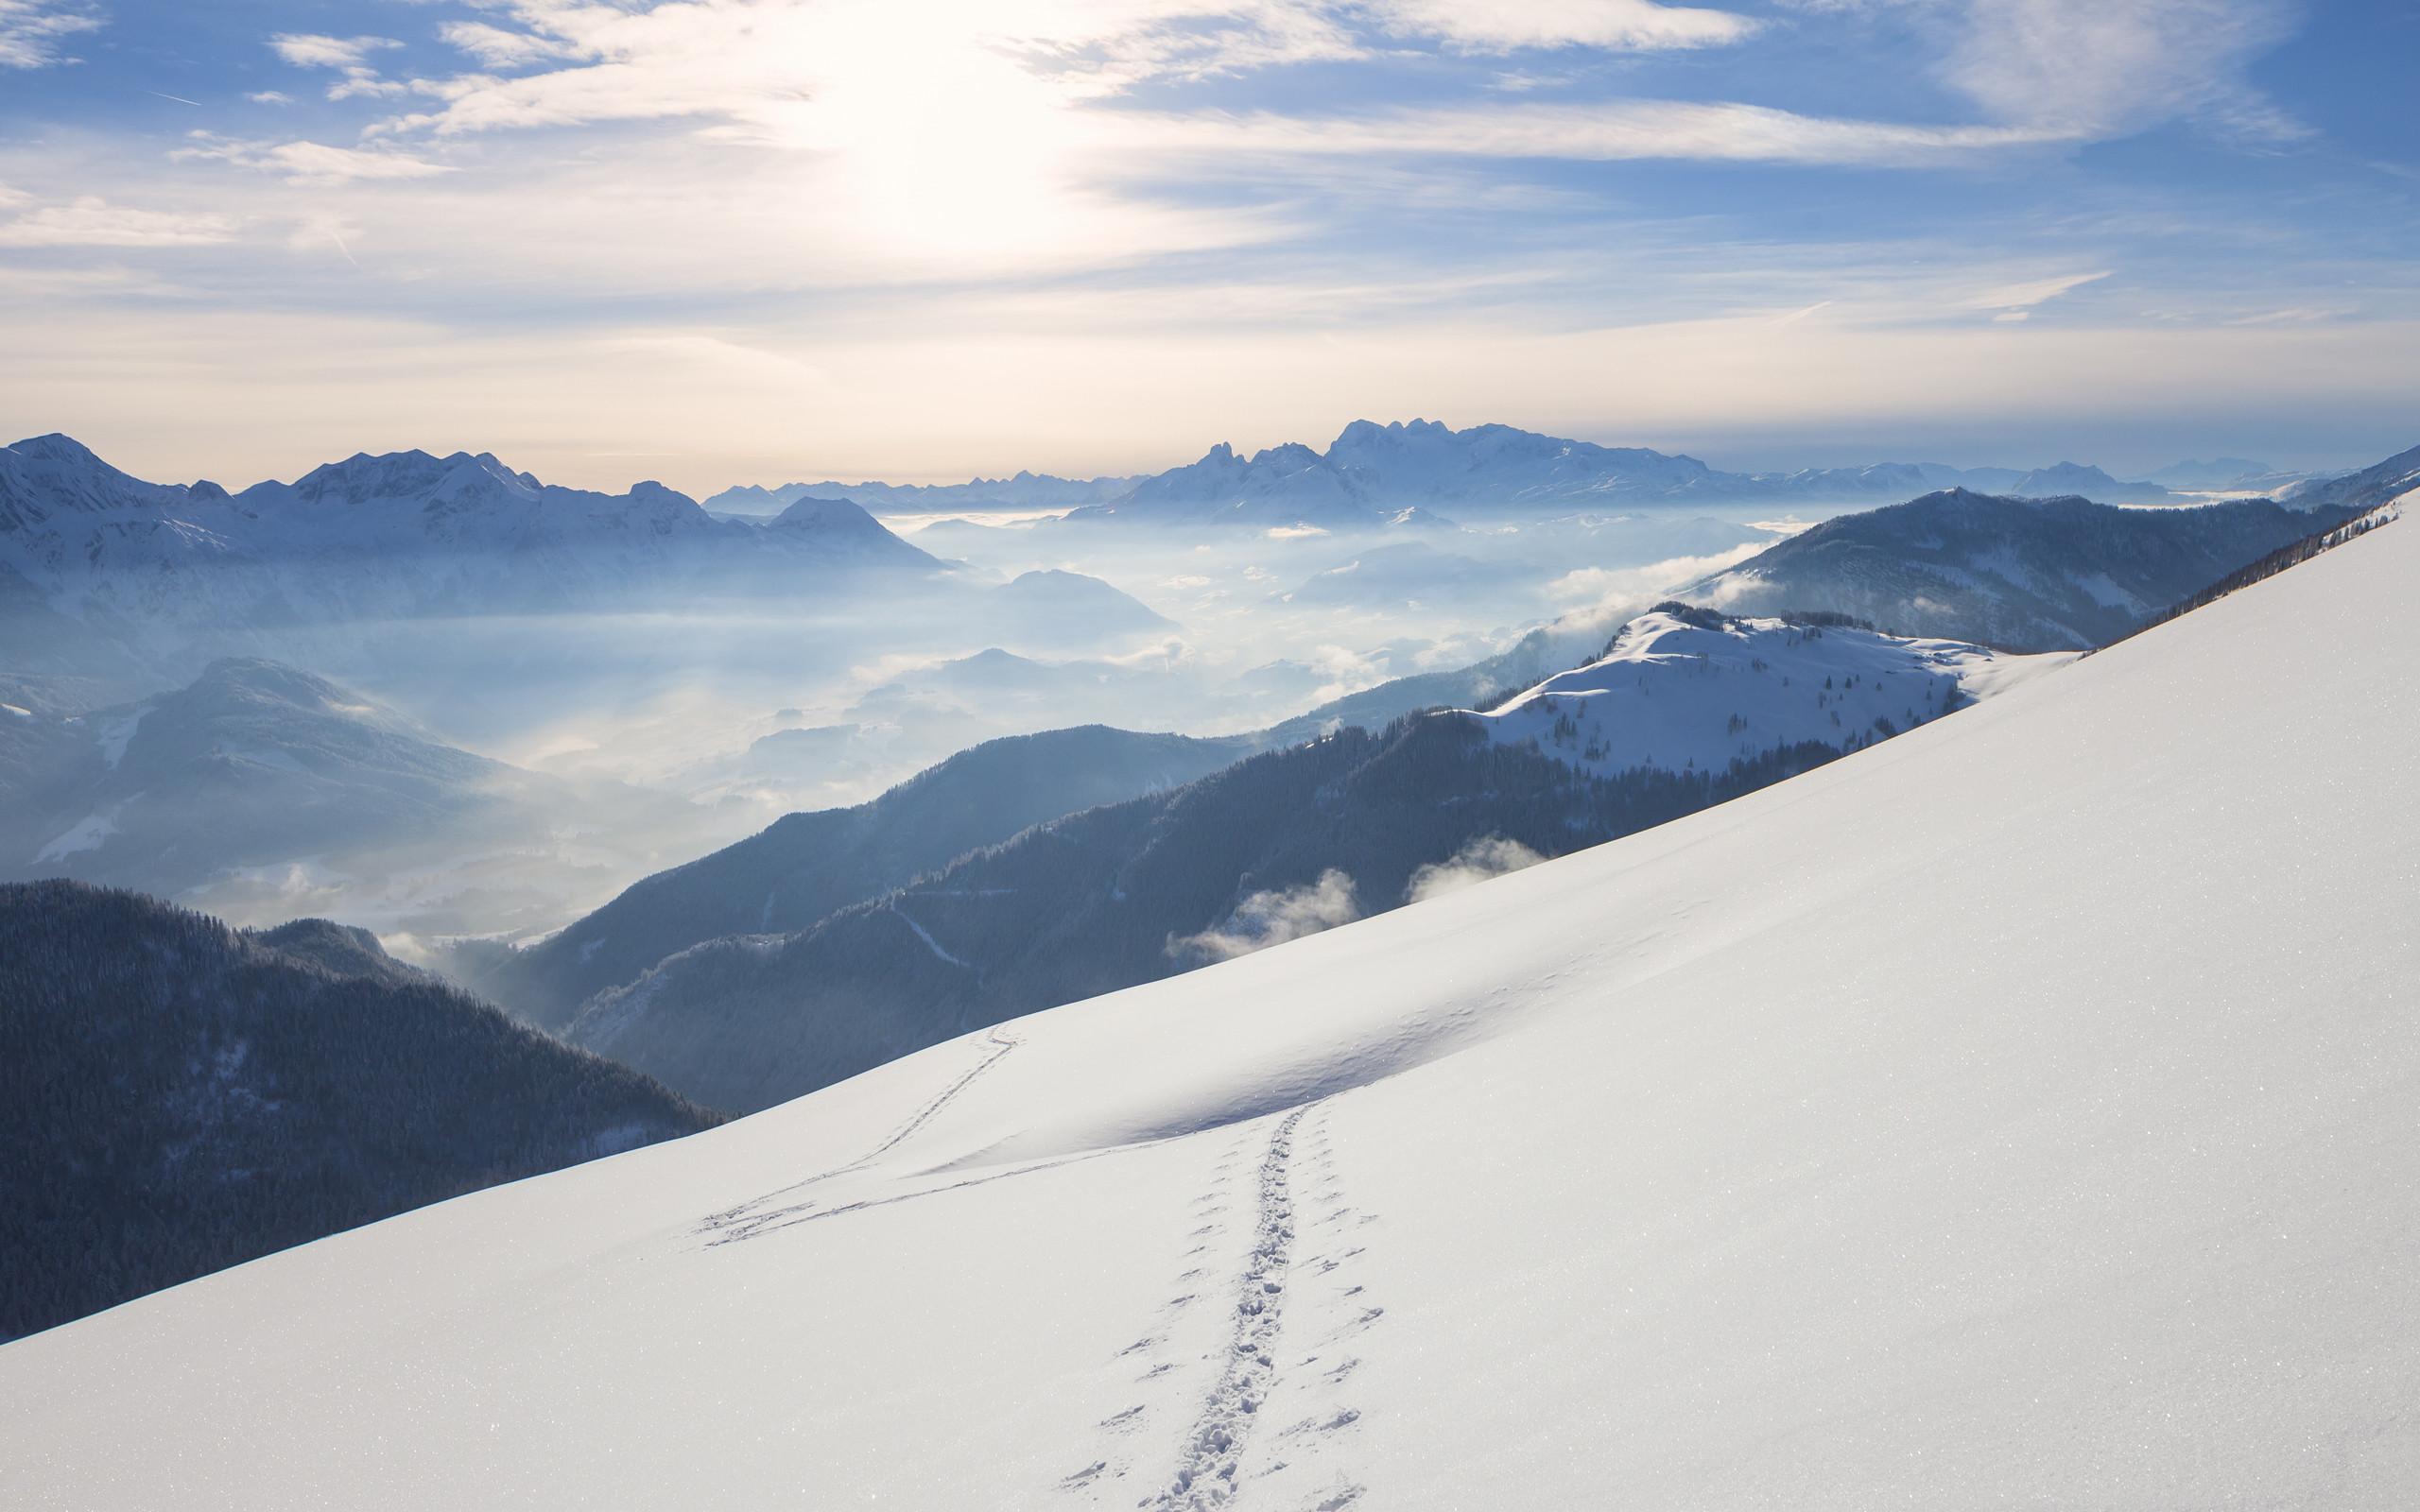 wallpaper.wiki-Snowy-Mountains-Desktop-Images-PIC-WPE001053